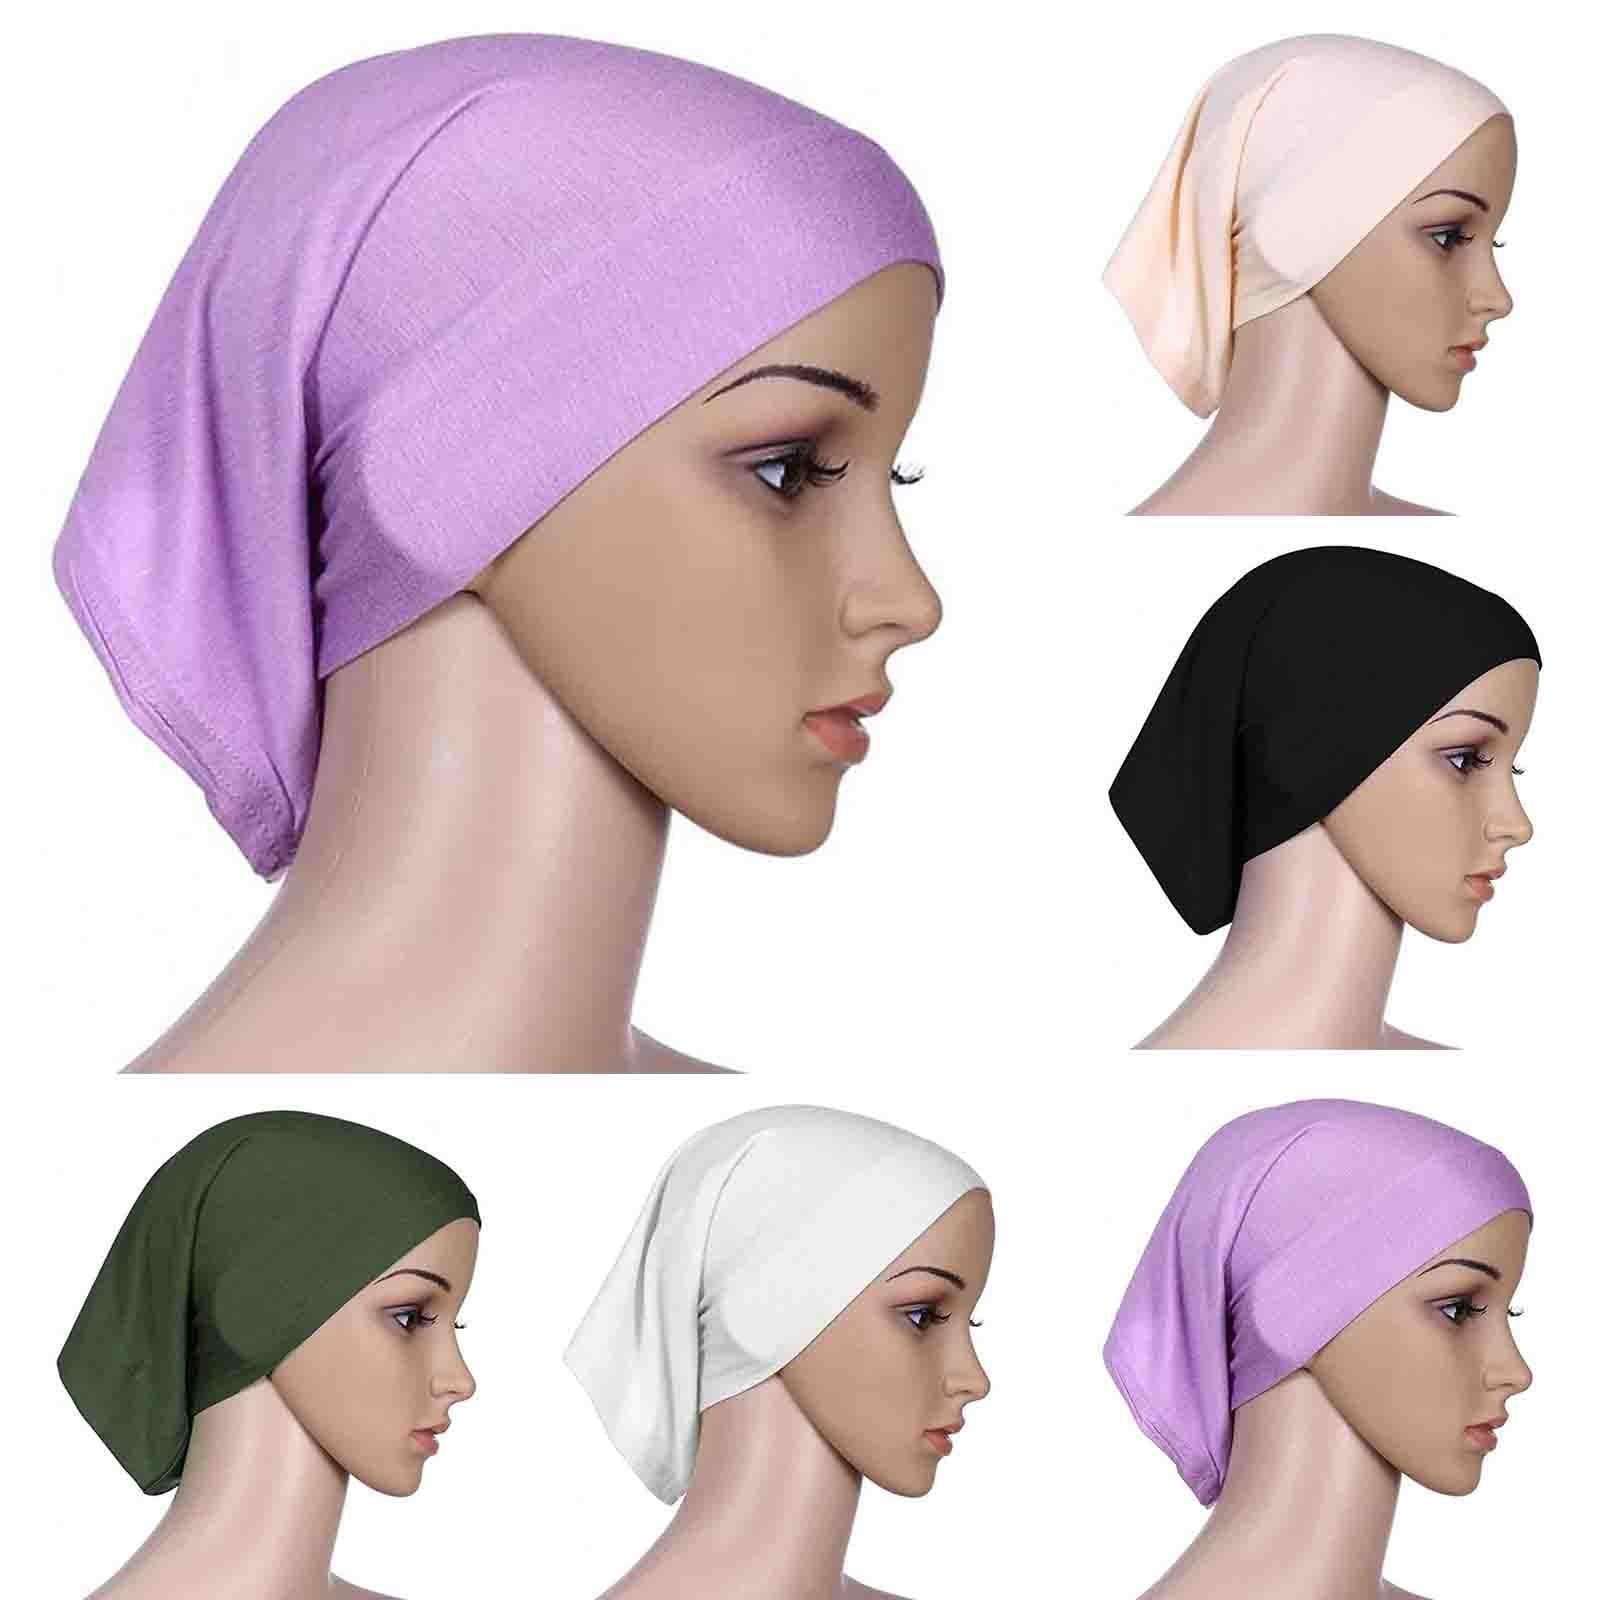 New Muslim Women Stretch Sleep Chemo Hat Beanie Sleep Turban Headwear Cap Head Wrap for Cancer Hair